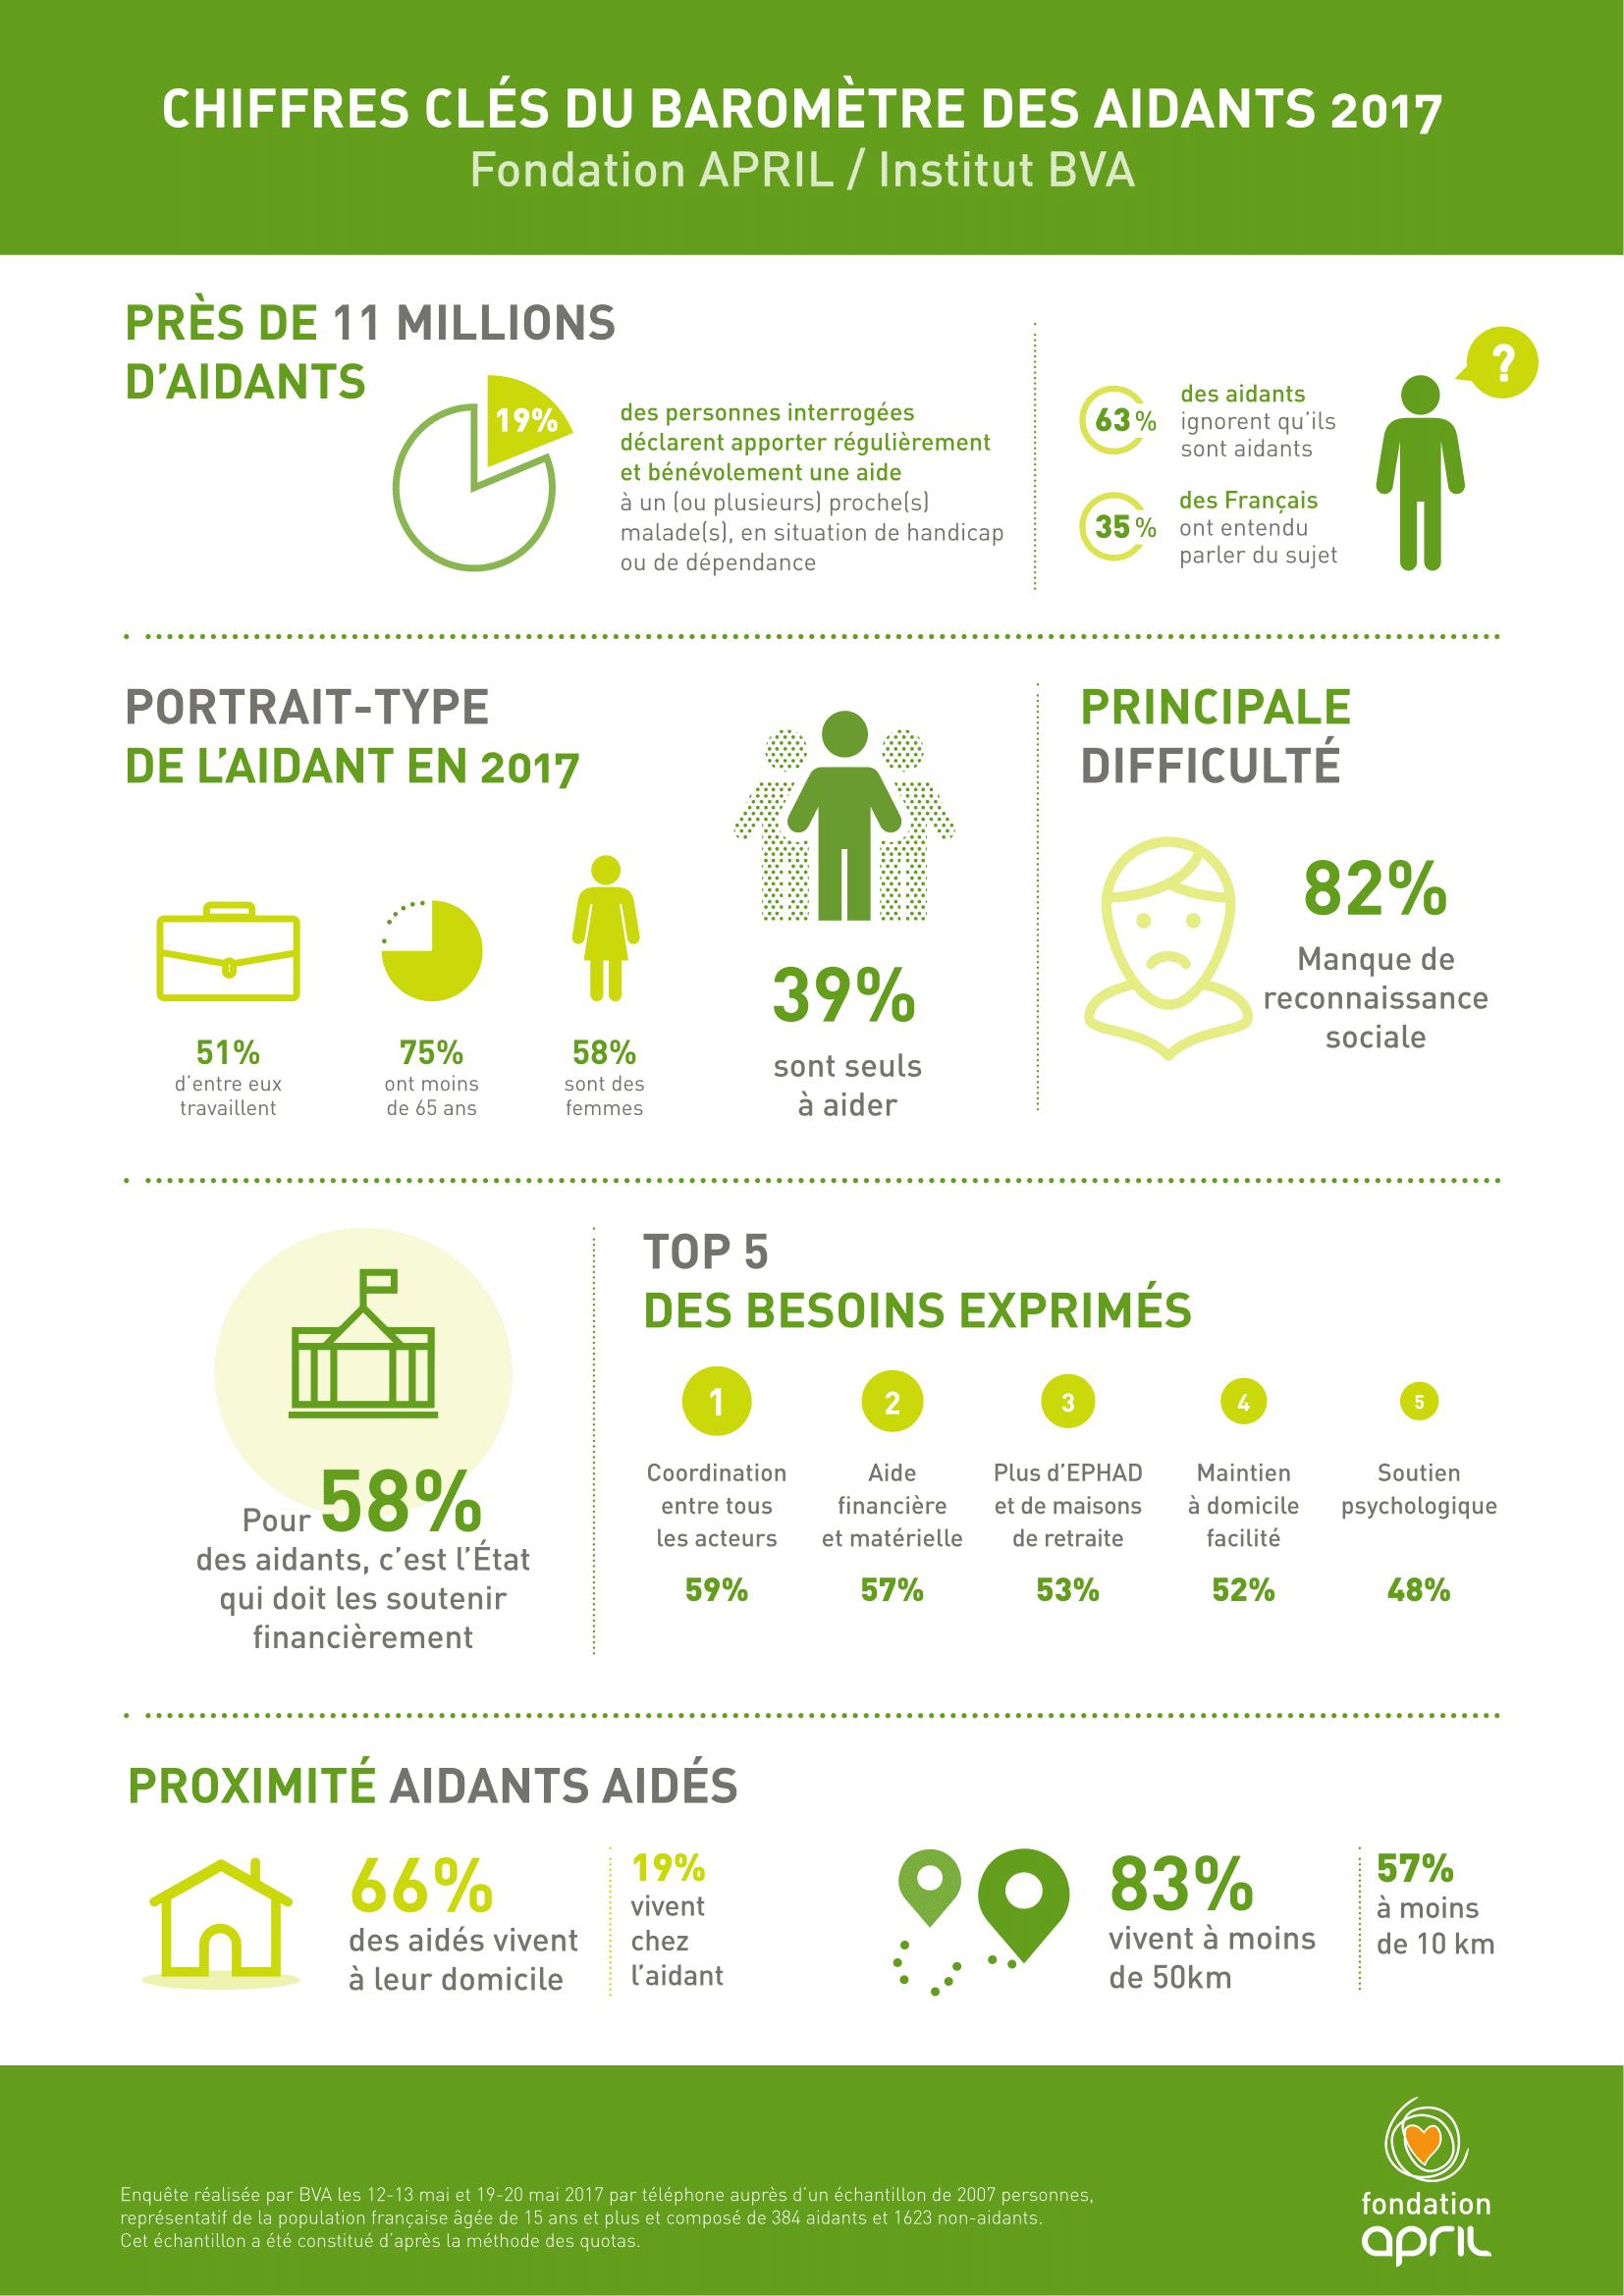 April_BaromètreAidants_Infographie-1